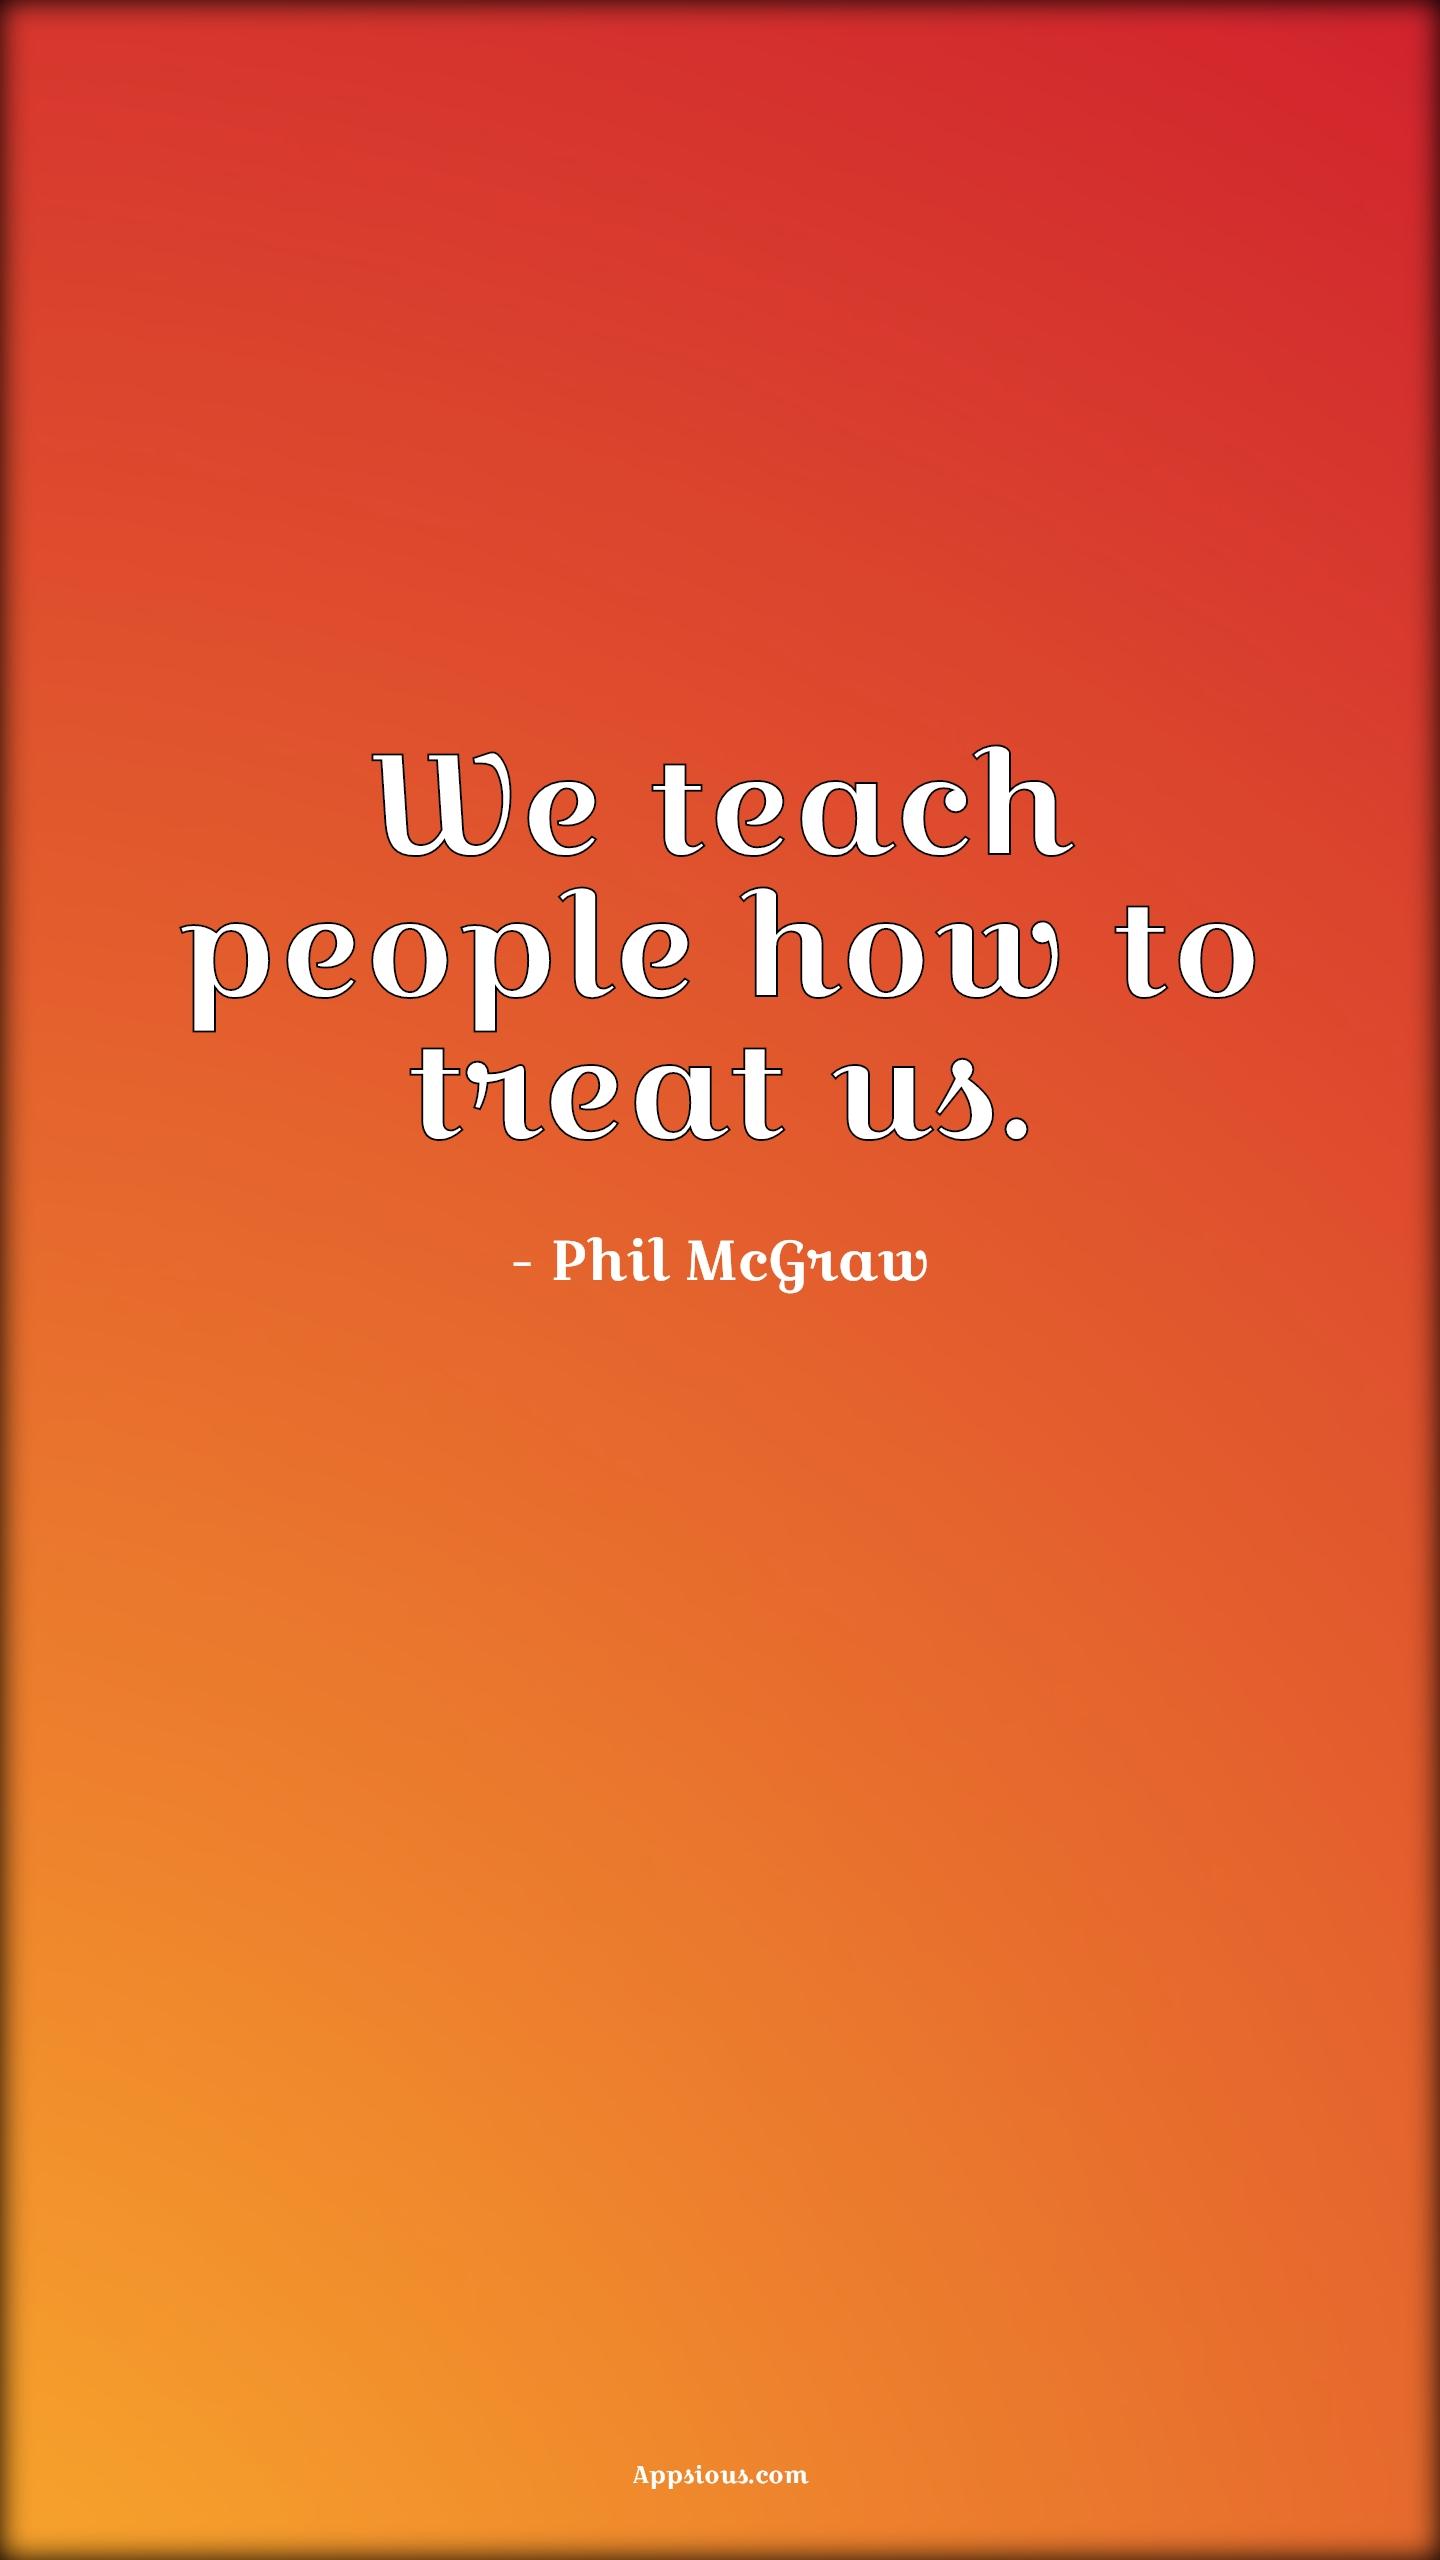 We teach people how to treat us.